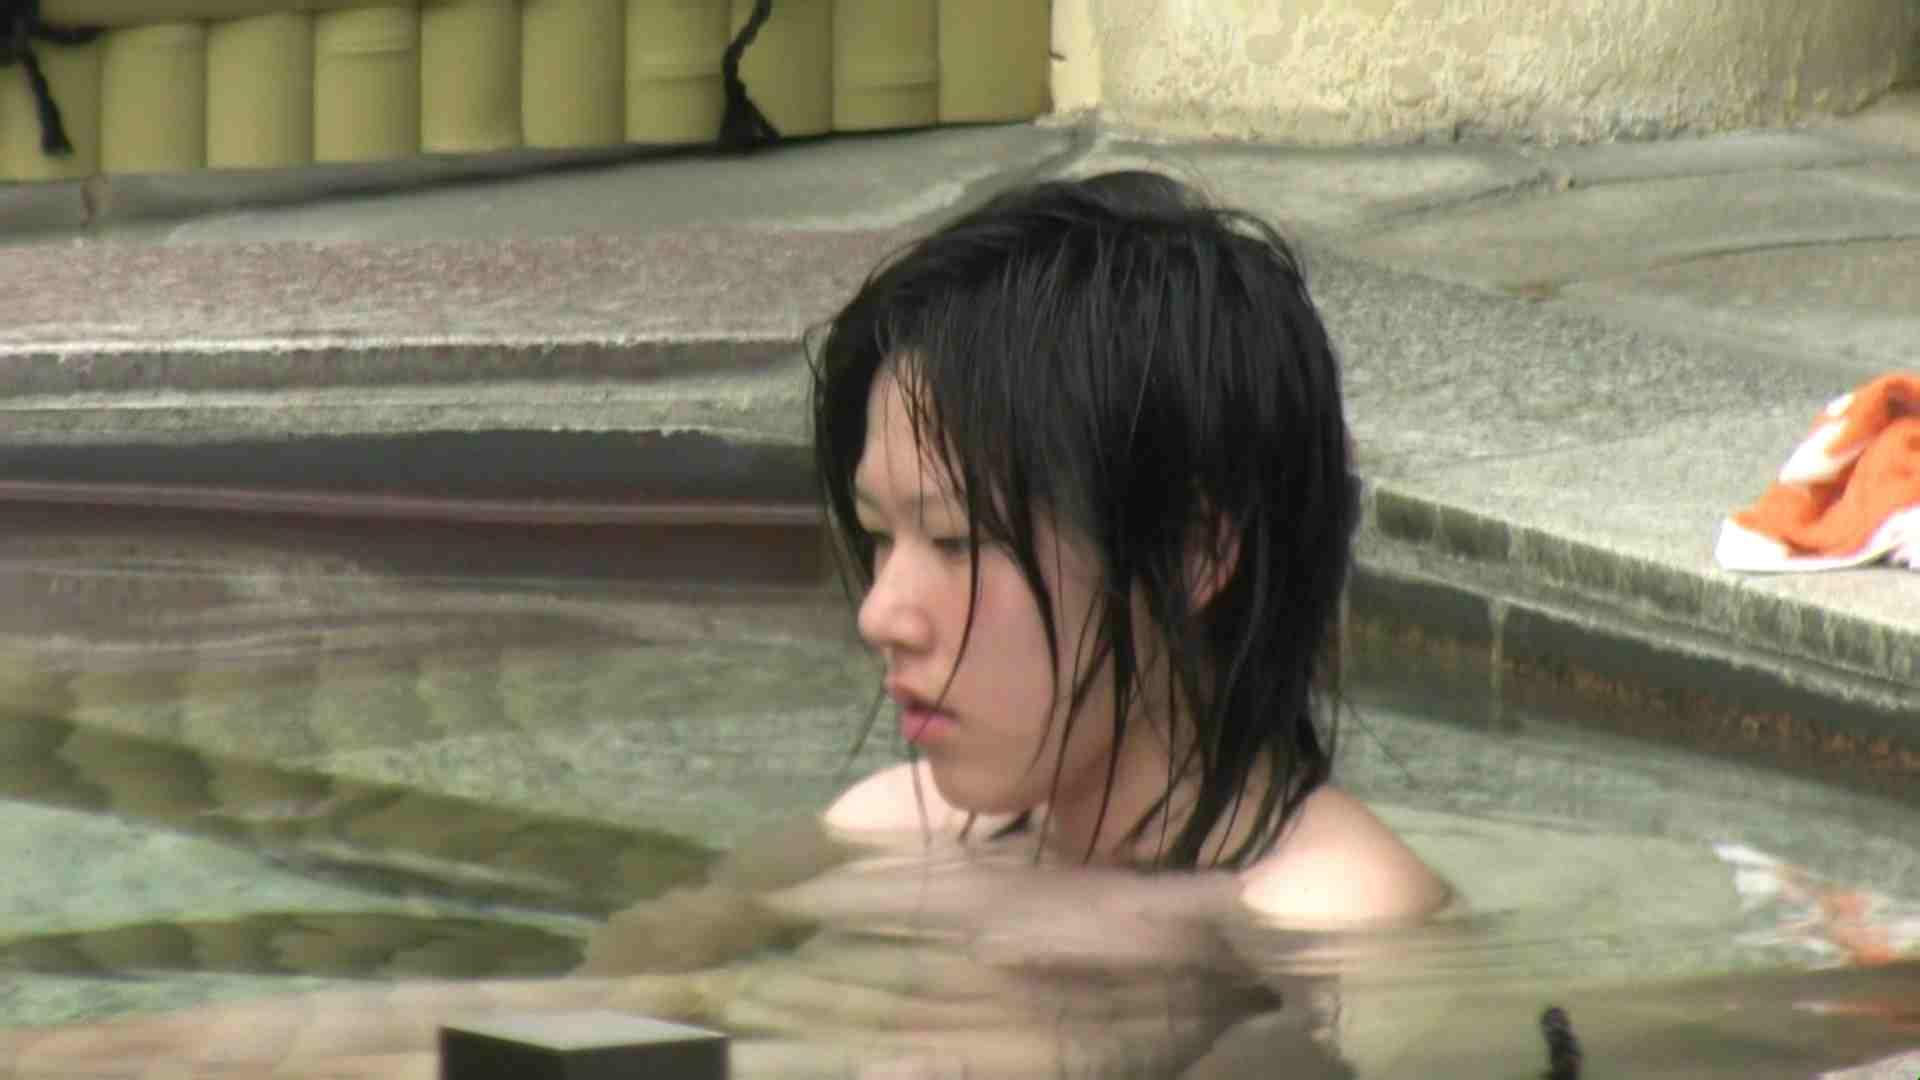 Aquaな露天風呂Vol.36 盗撮シリーズ   露天風呂編  99PIX 49